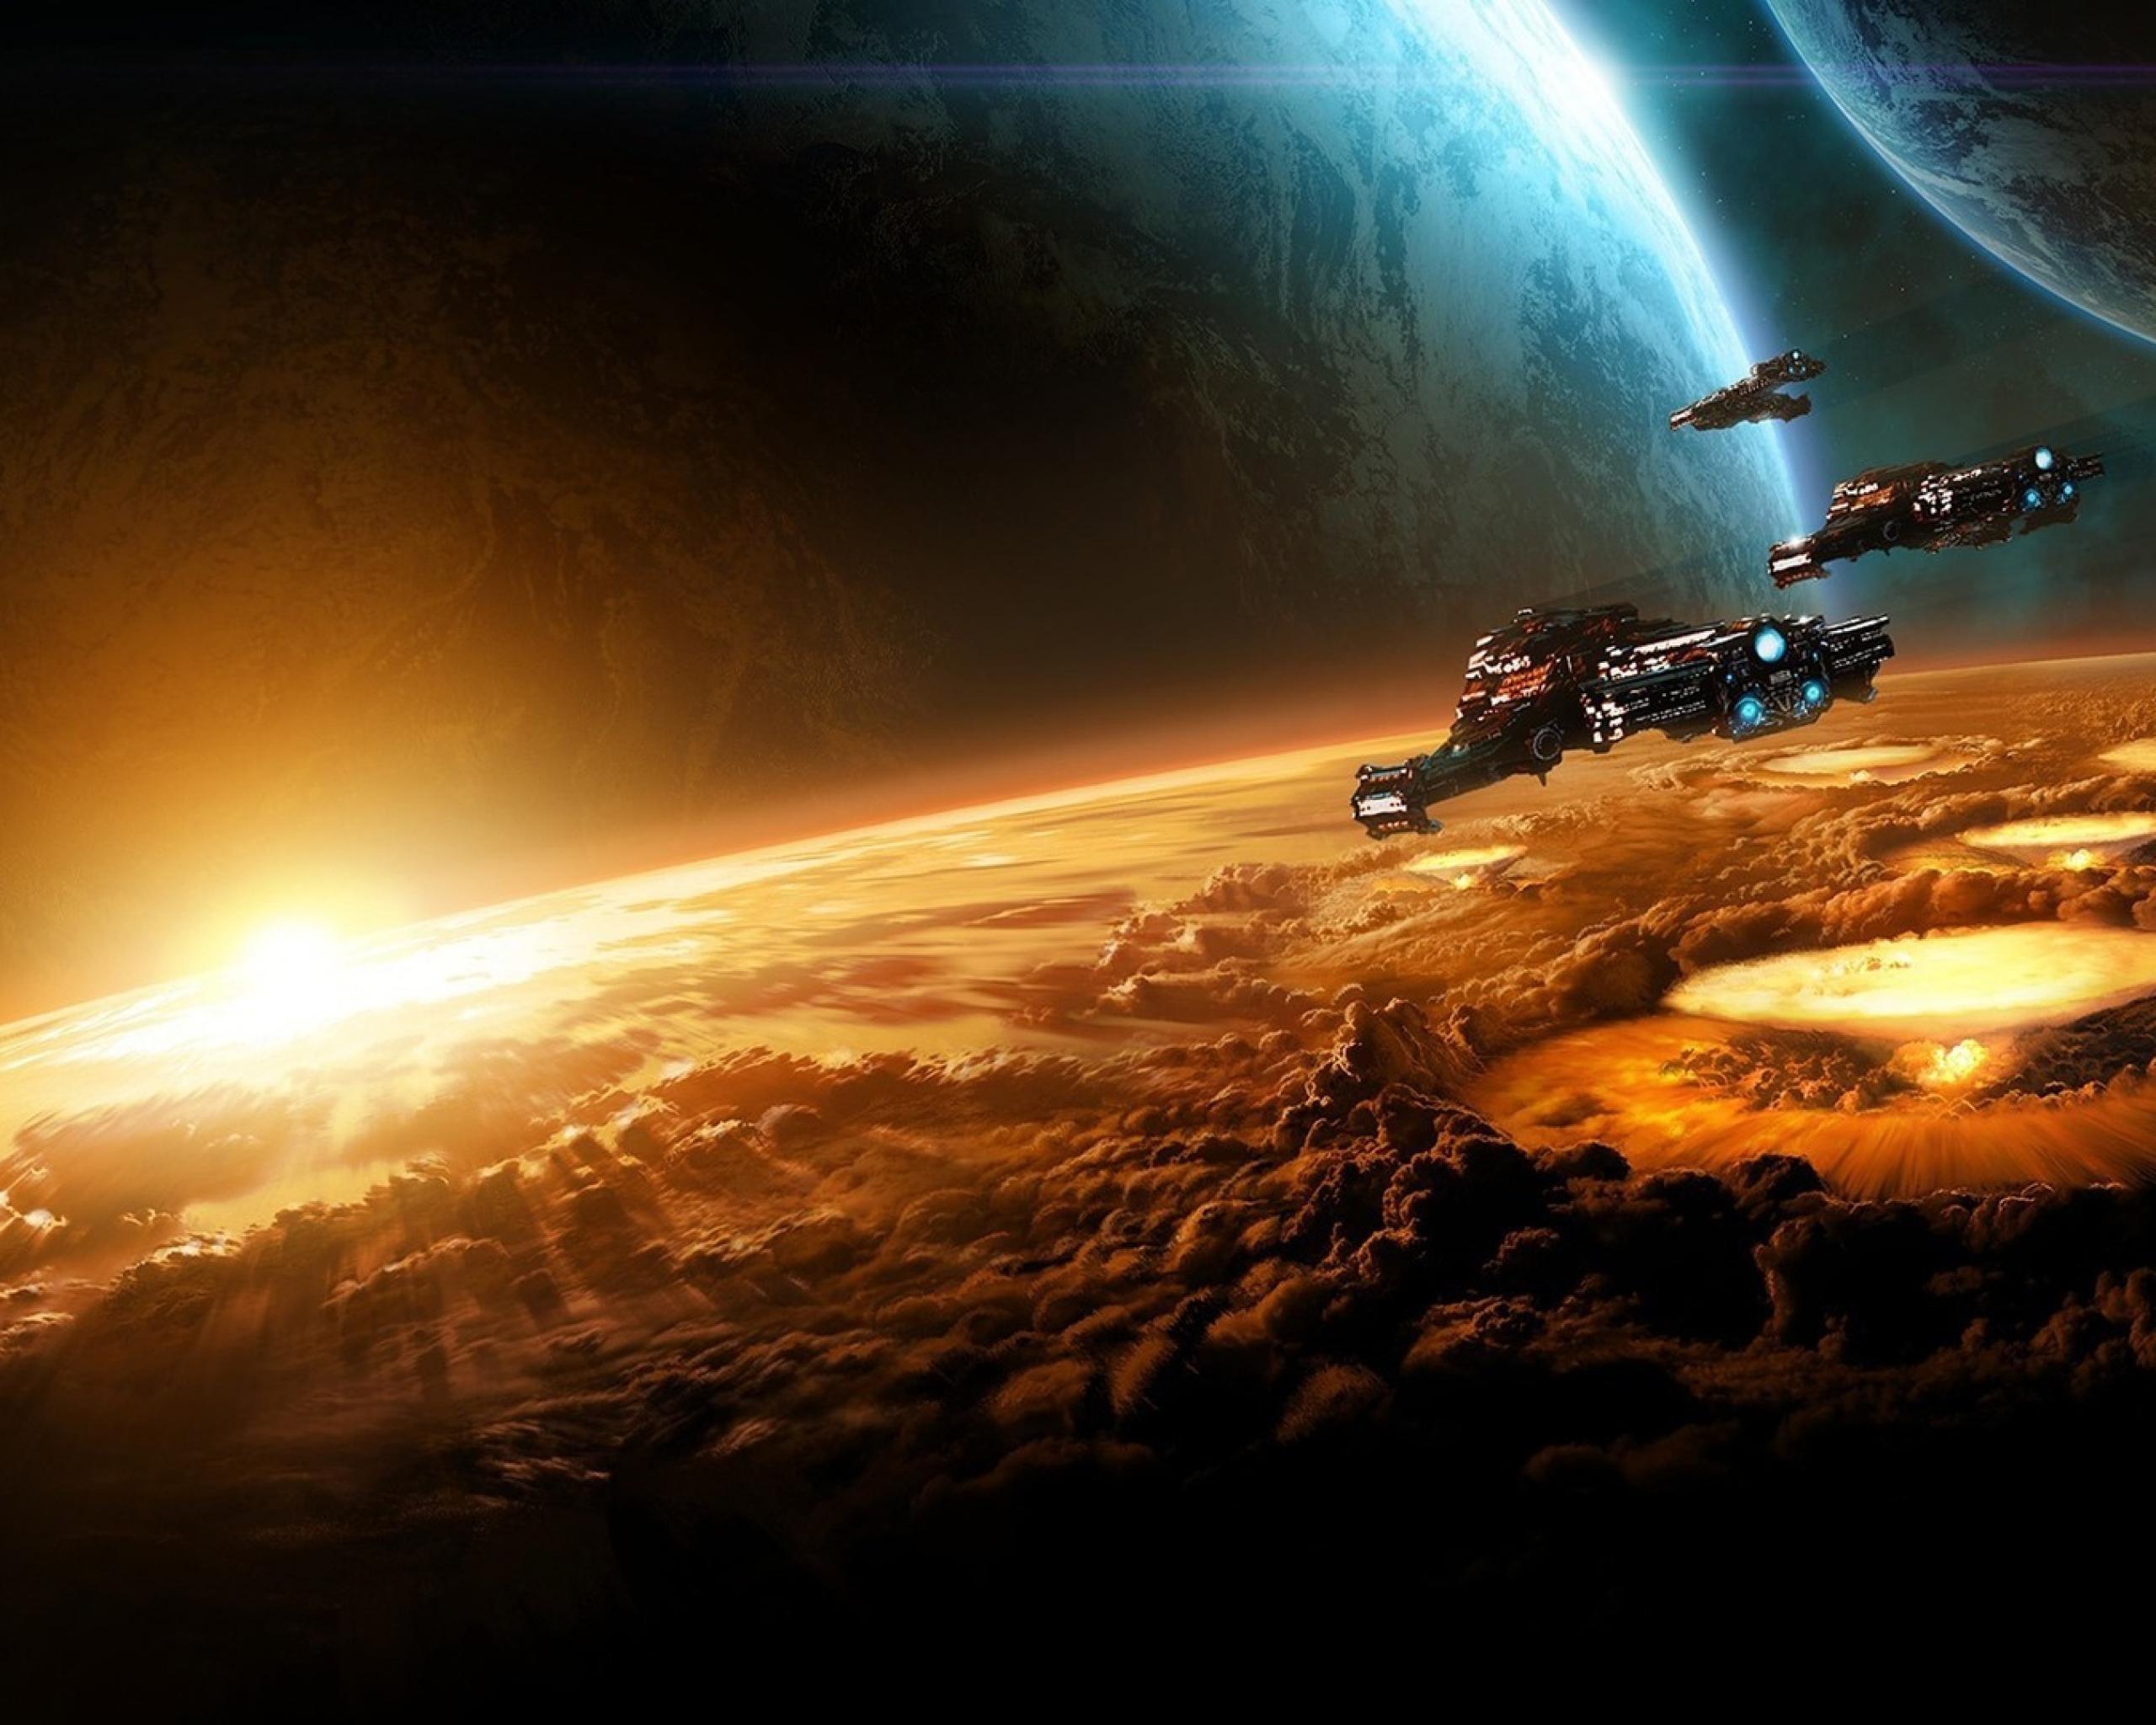 Wallpaper Spaceship Digital Galaxy Planet Sci Fi Wallpaper, HQ .